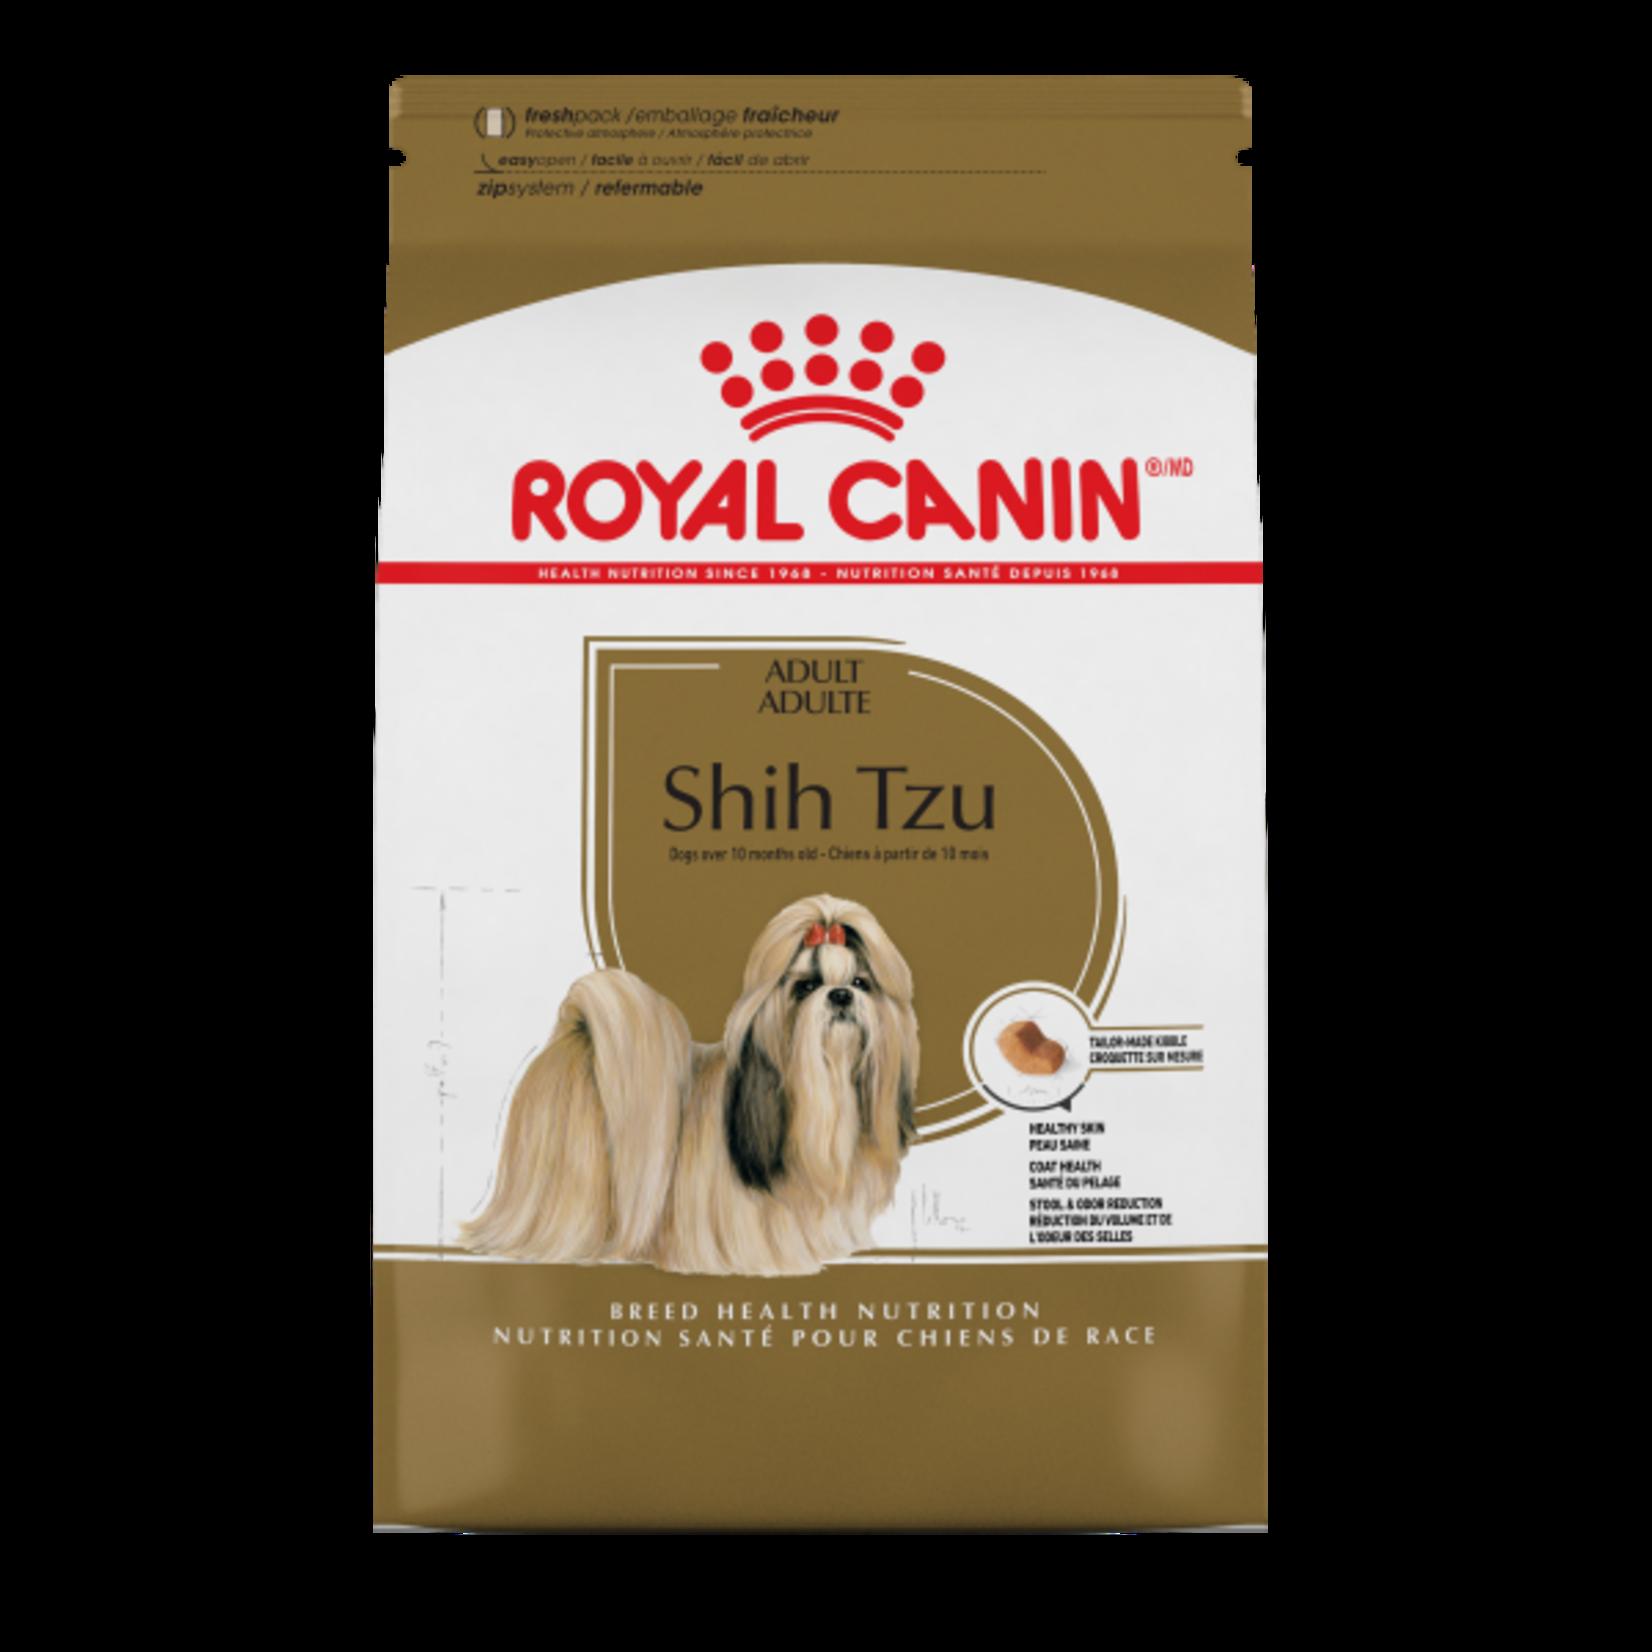 Royal Canin Shih Tzu 2.5lb